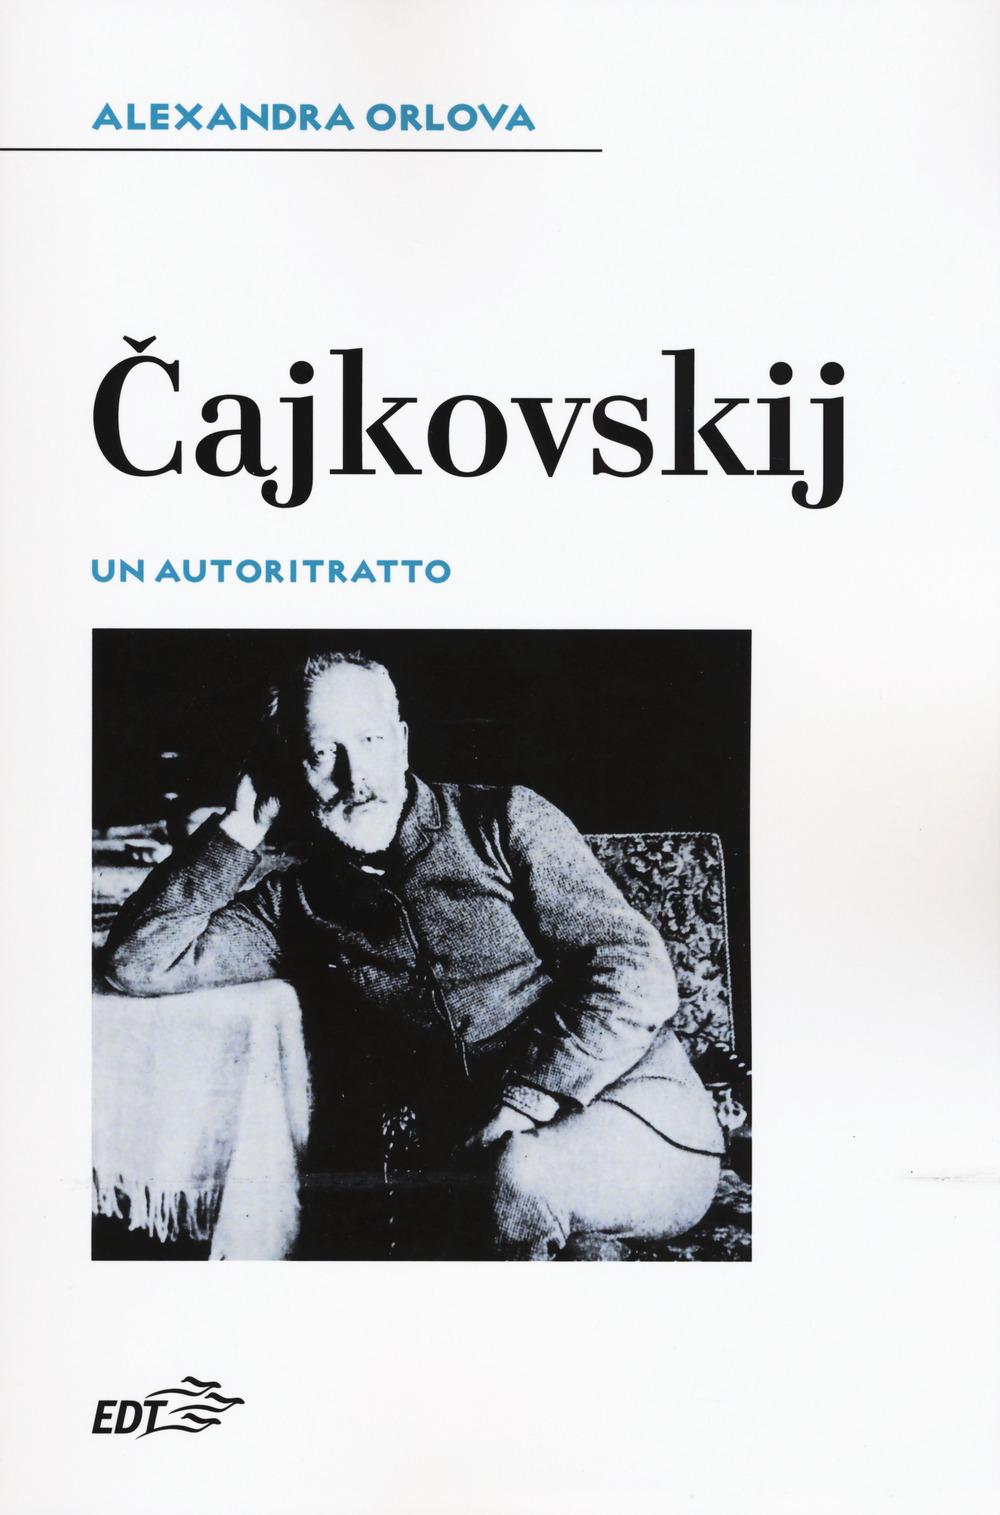 Image of Cajkovskij. Un autoritratto